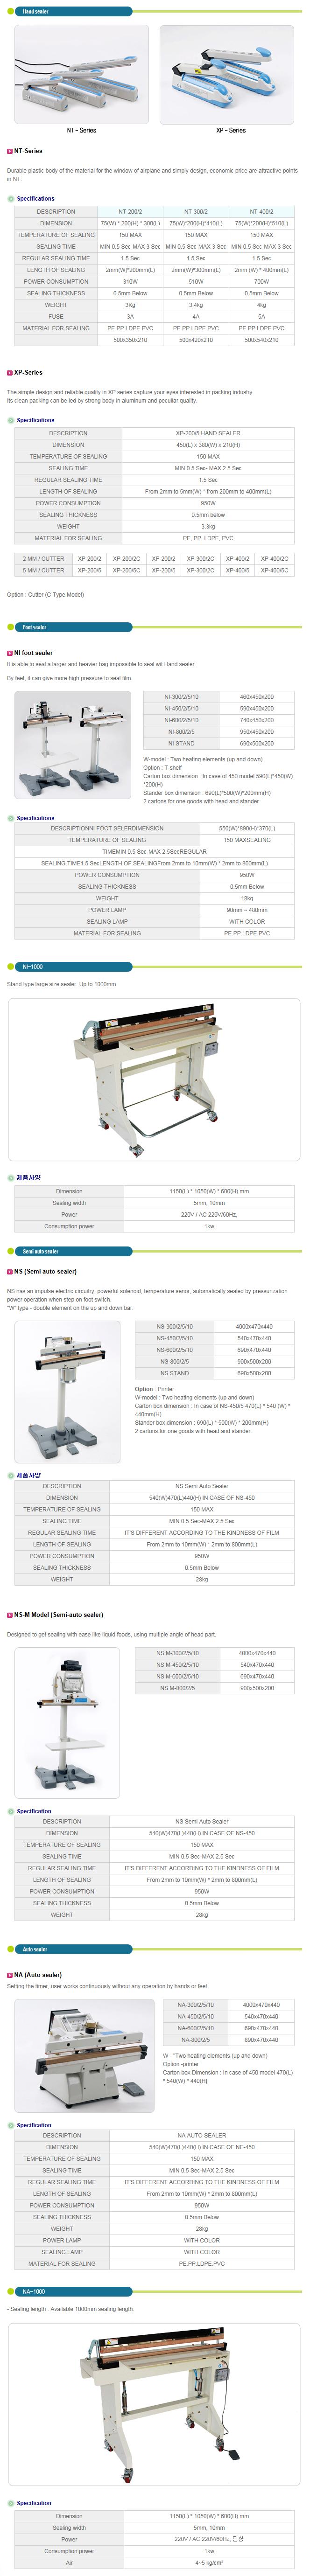 HANA Electric sealer